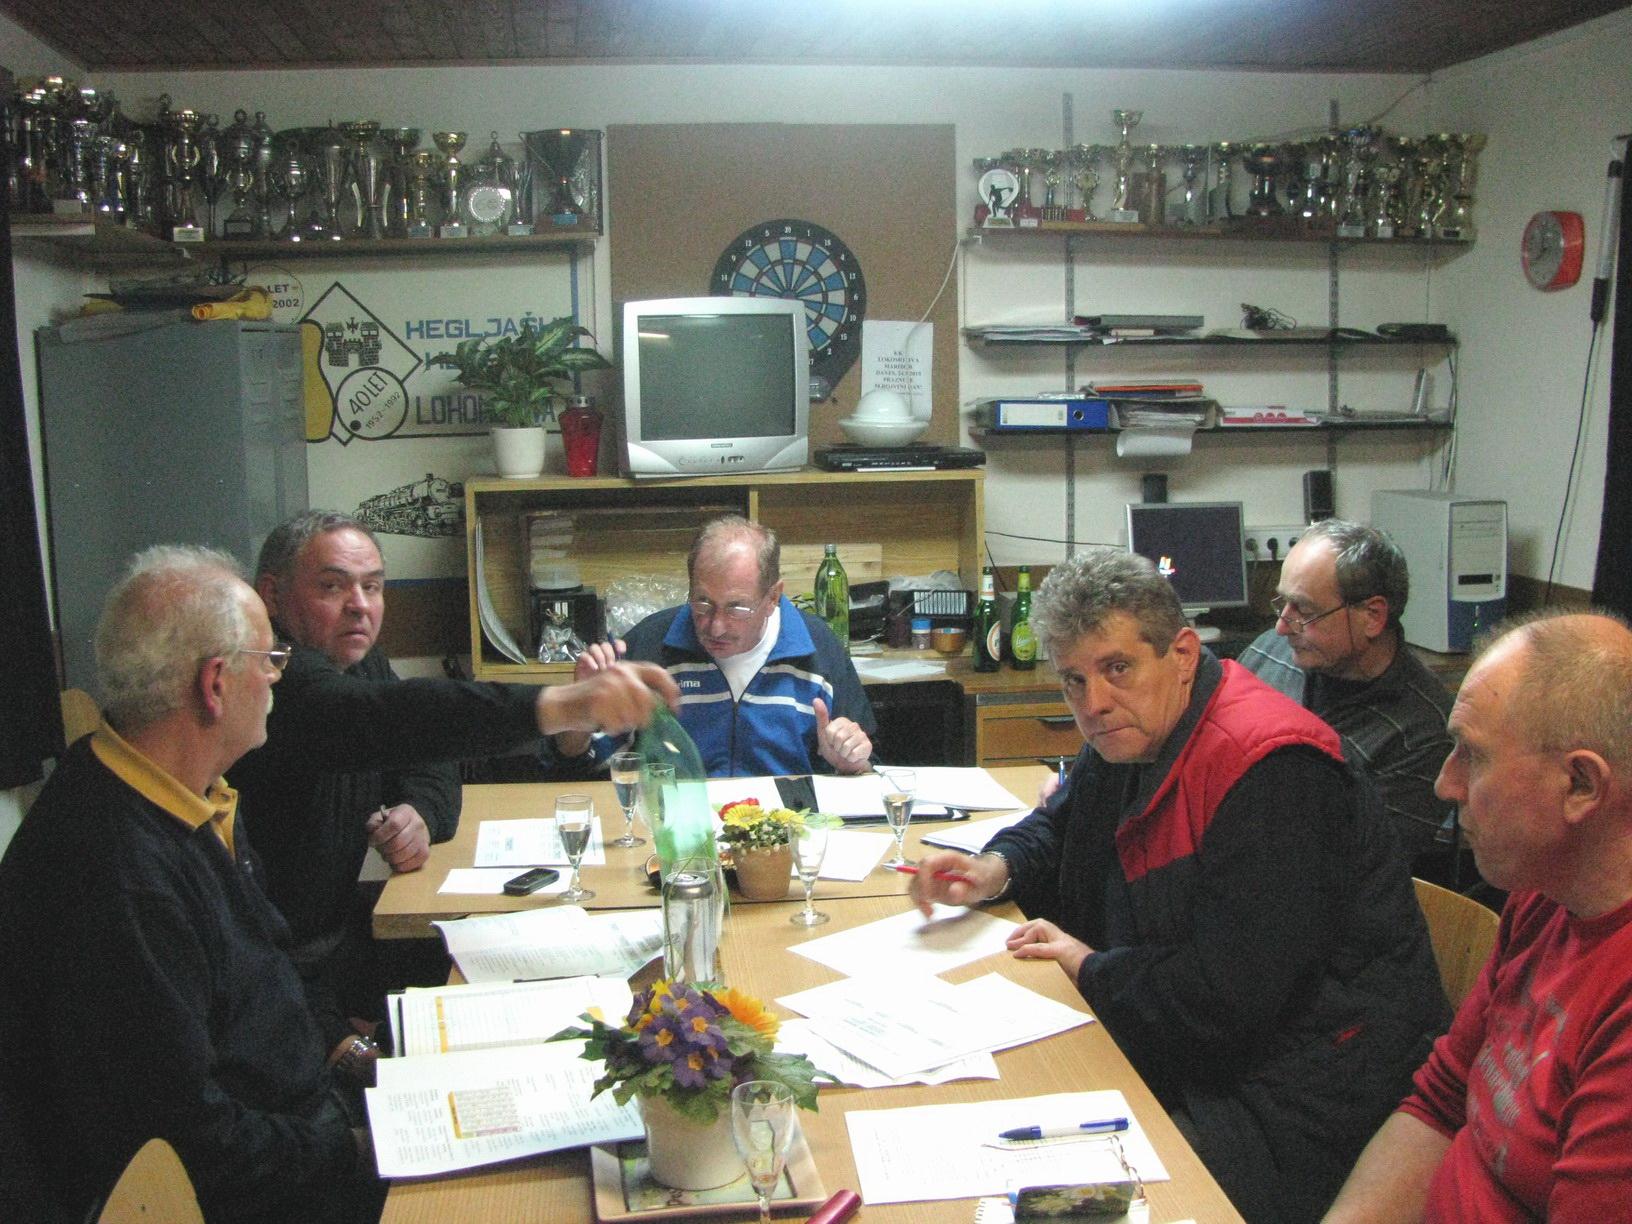 Organizacijski odbor za 60. obletnico, 2012